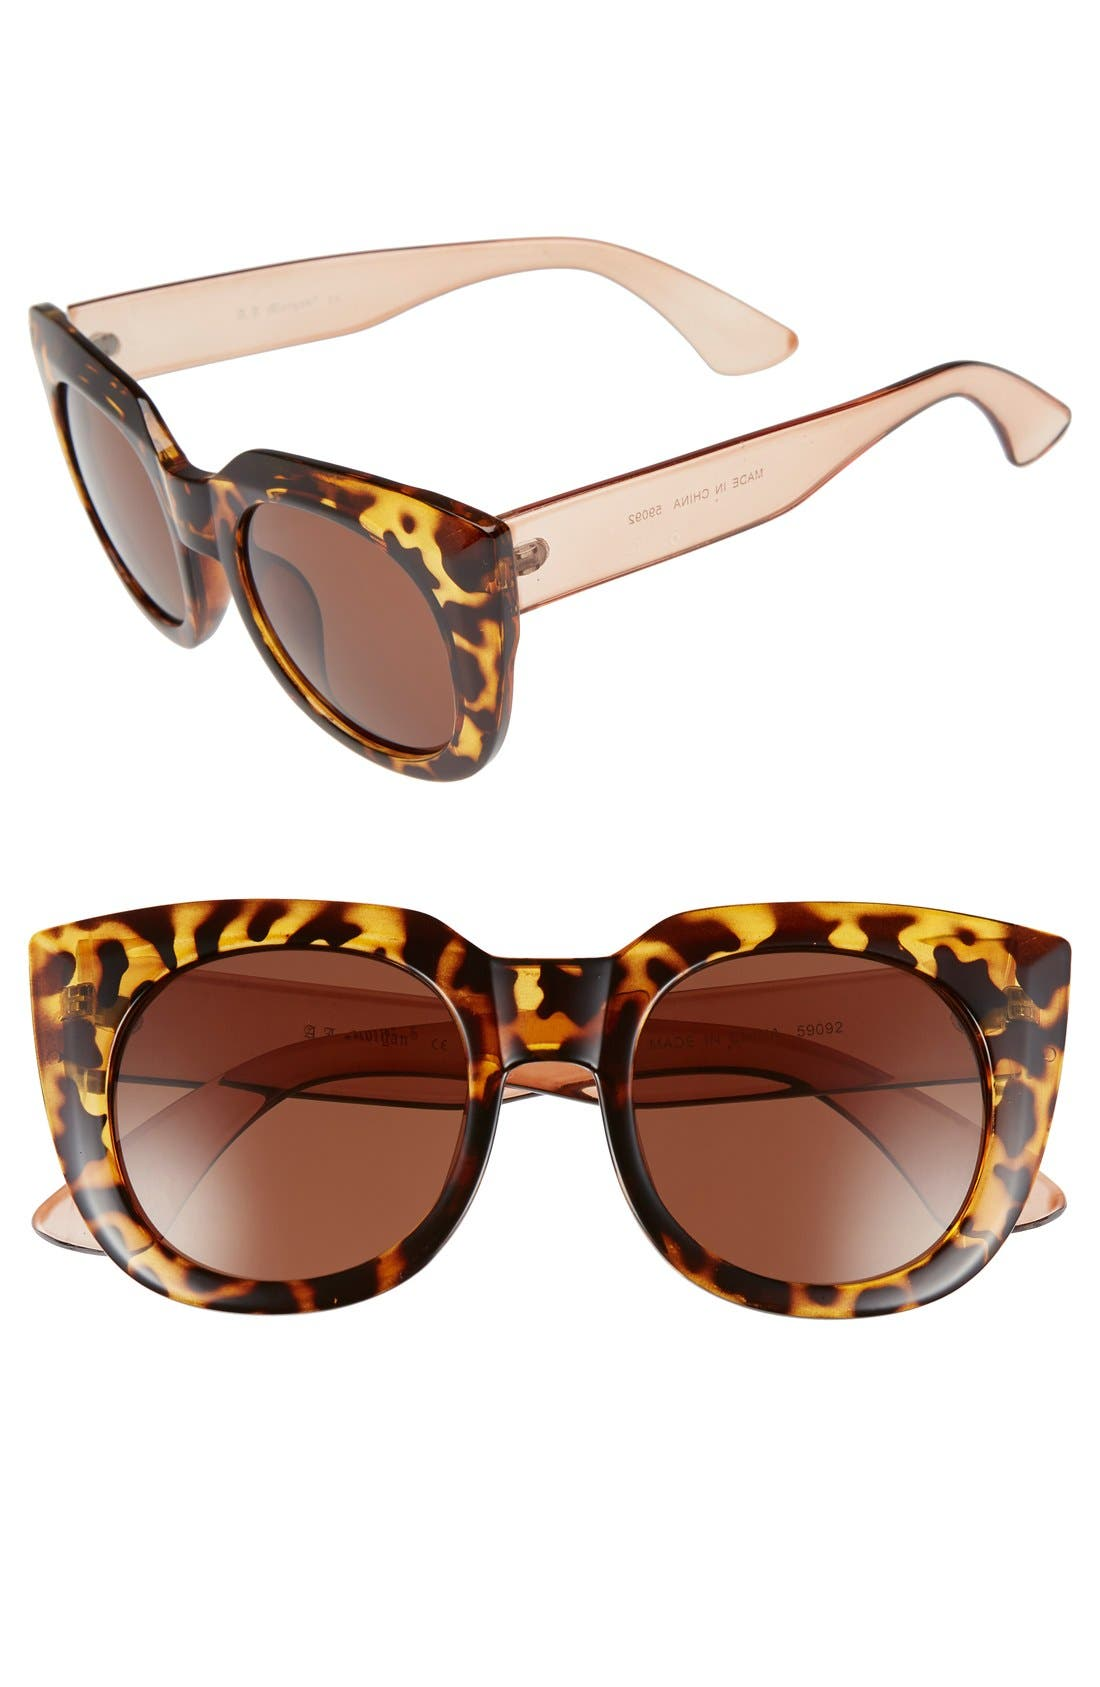 Main Image - A.J. Morgan 'Beam' 50mm Sunglasses